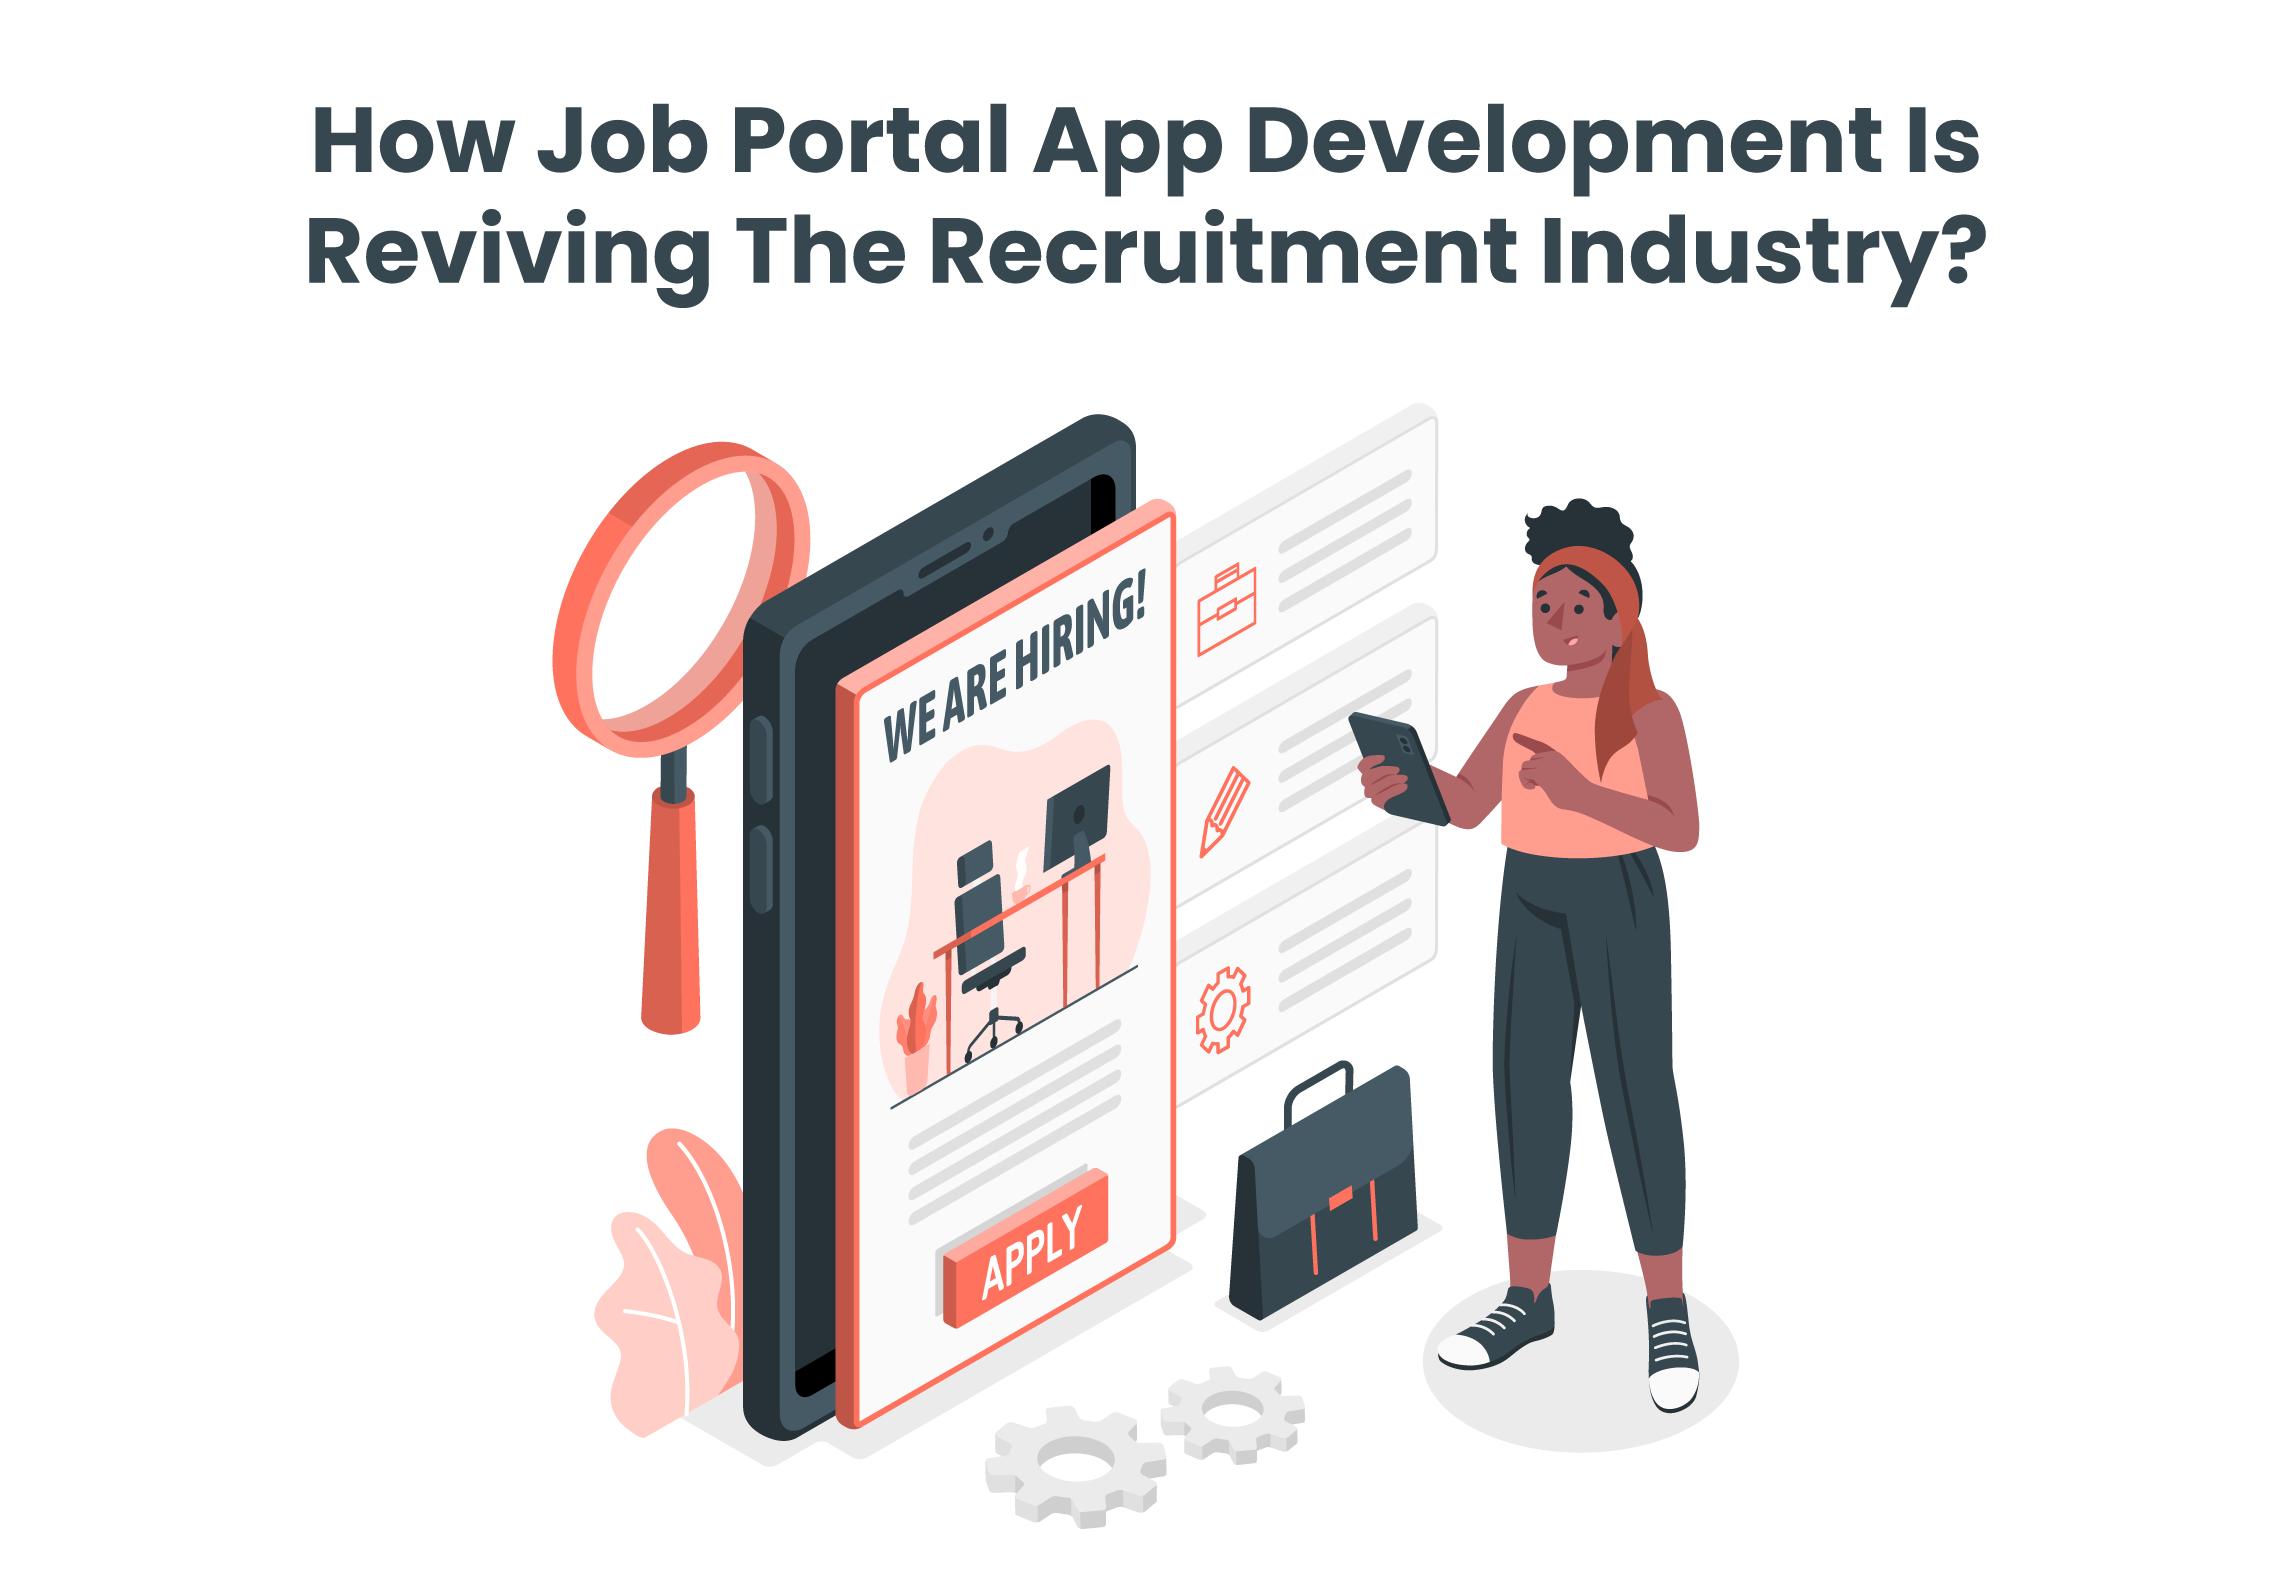 How Job Portal App Development Is Reviving The Recruitment Industry